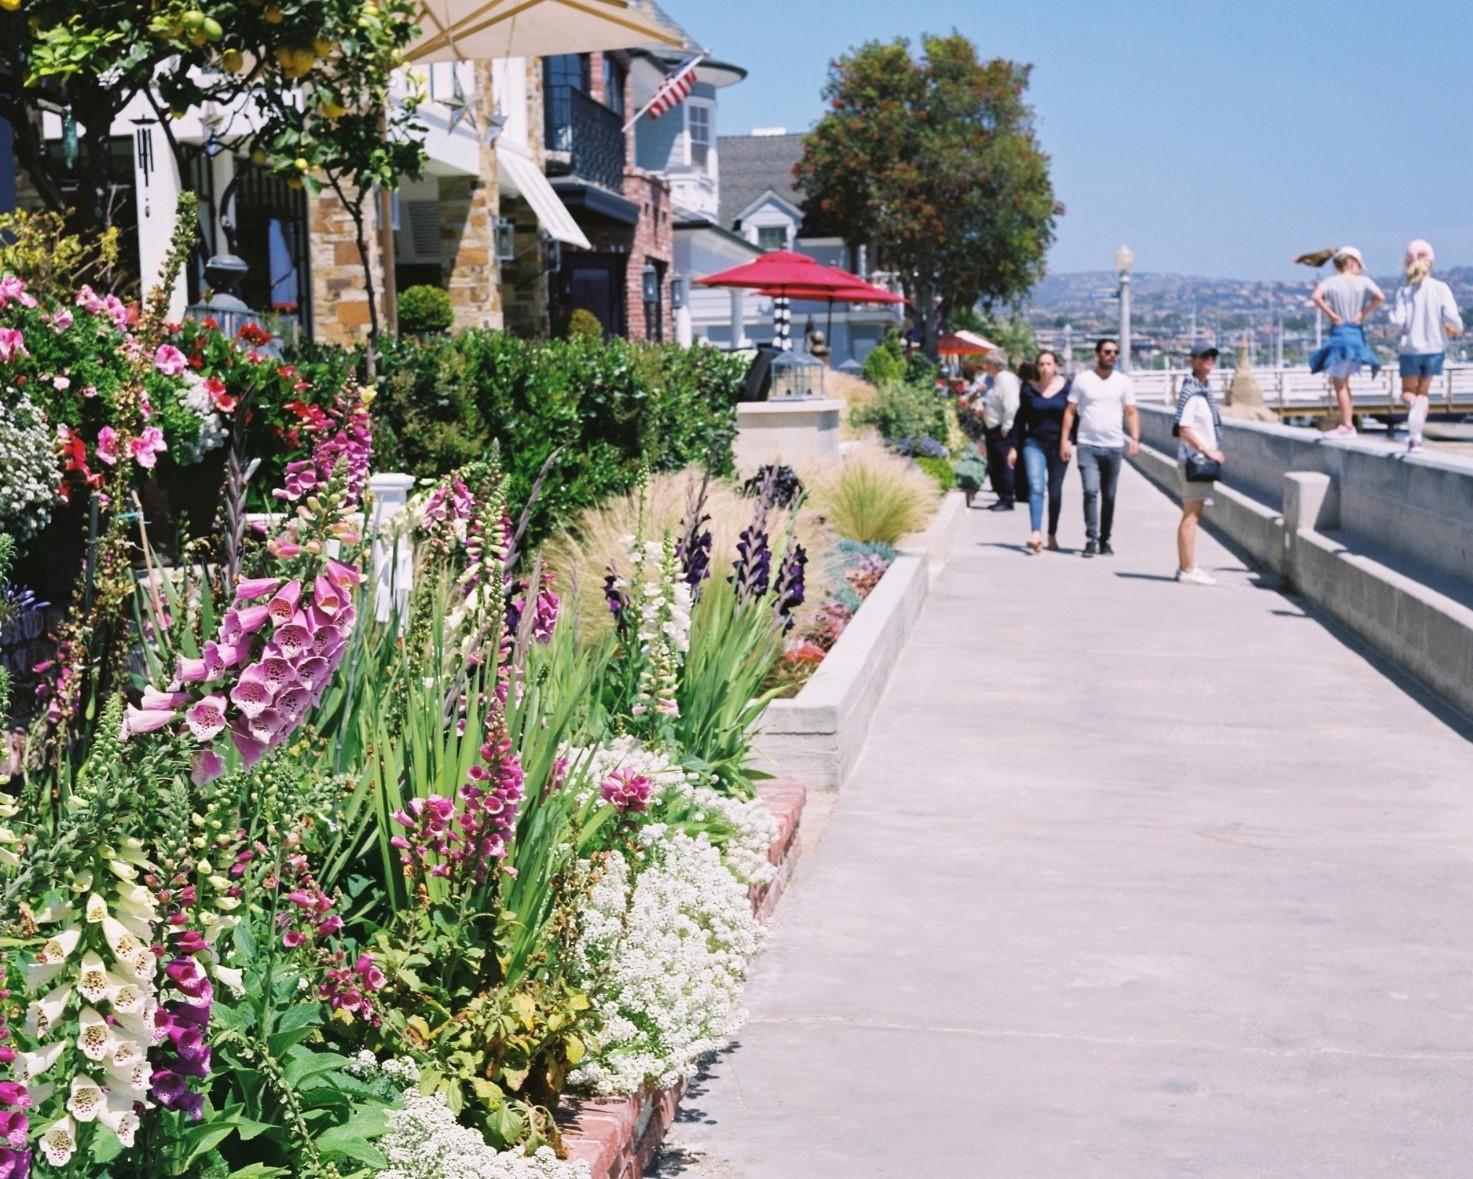 Boardwalk and Extended Seawall, Balboa Island, Newport Beach, CA.